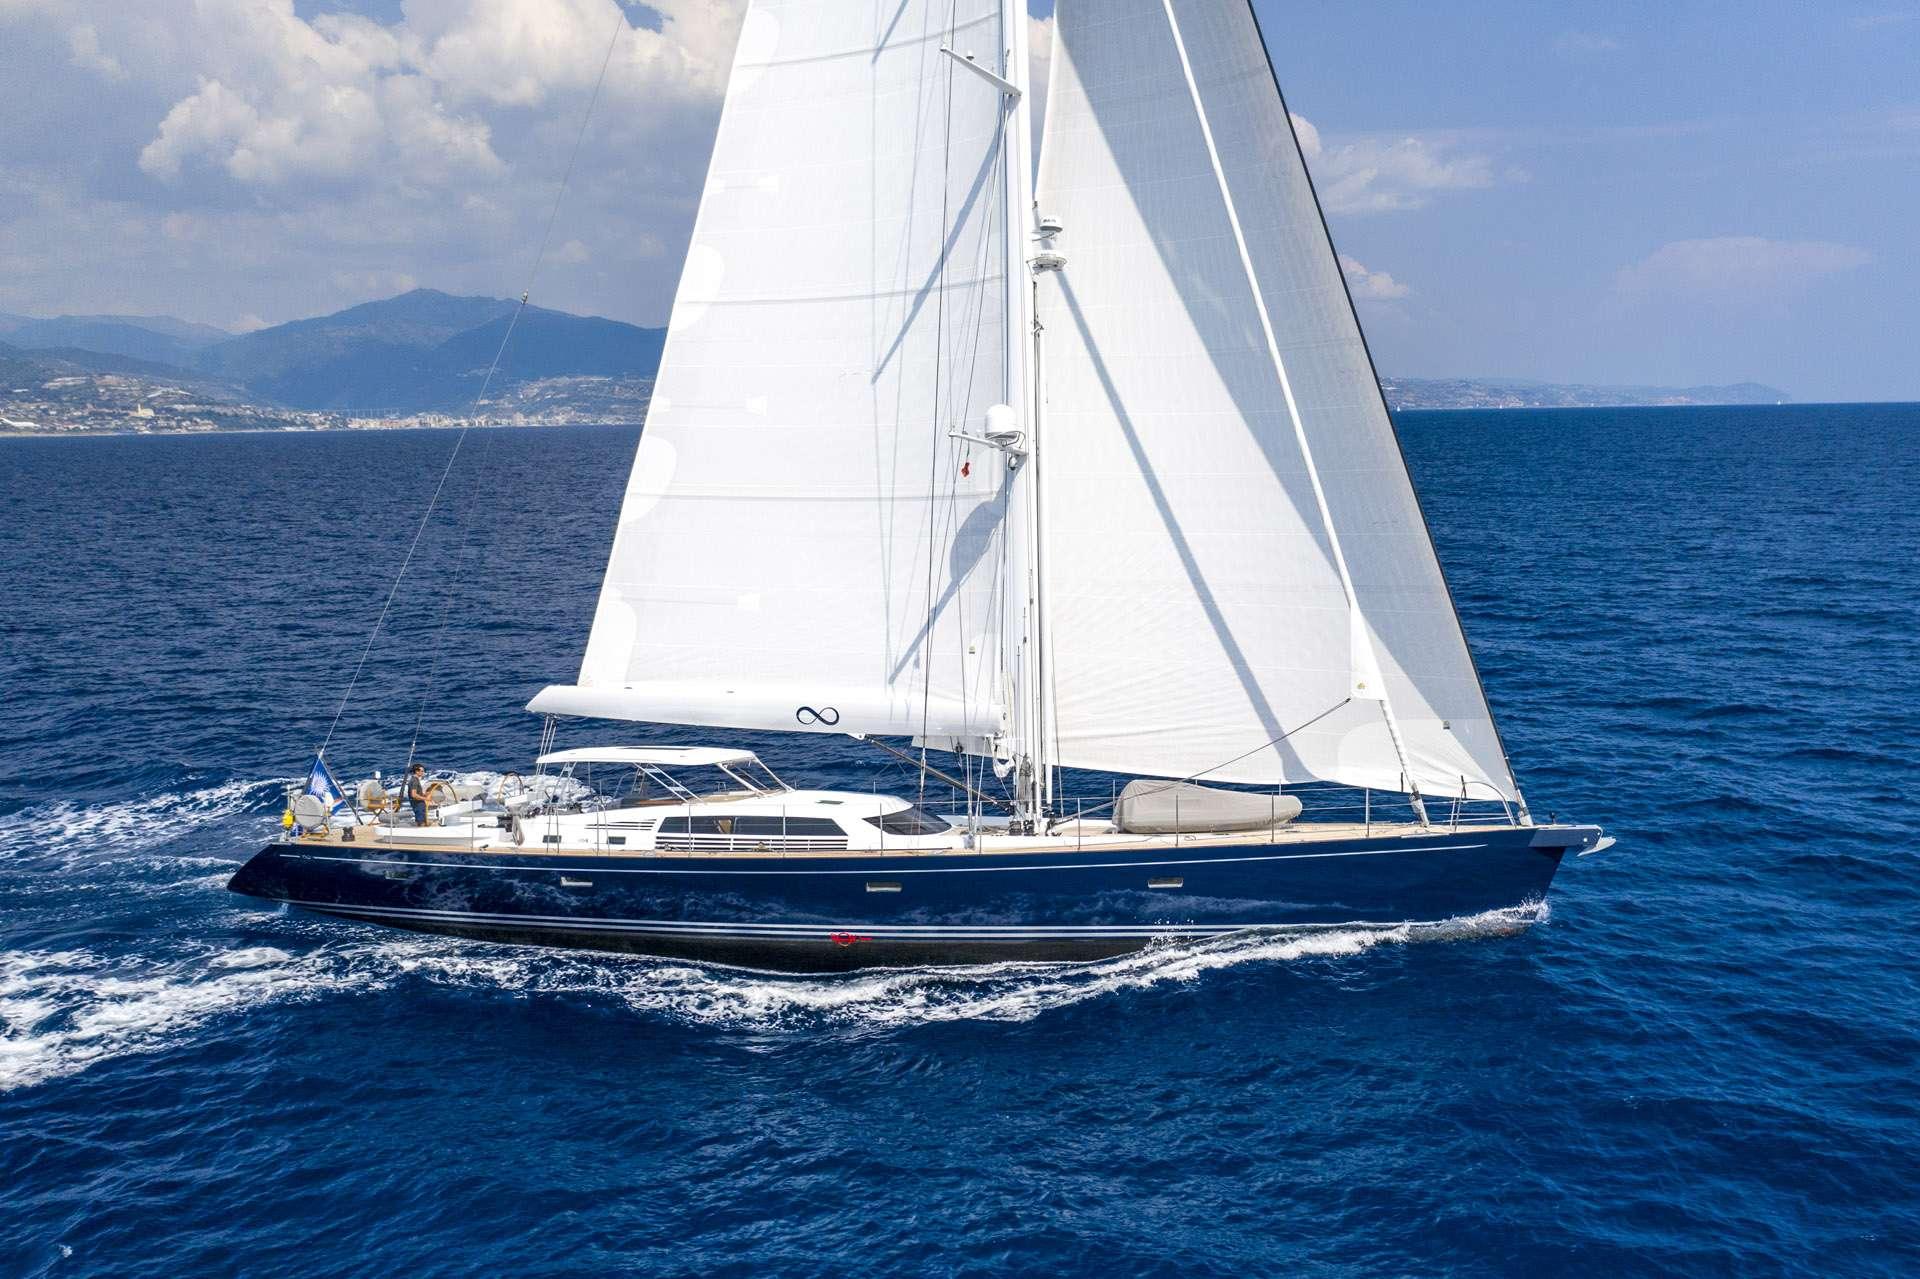 Main image of LADY 8 yacht